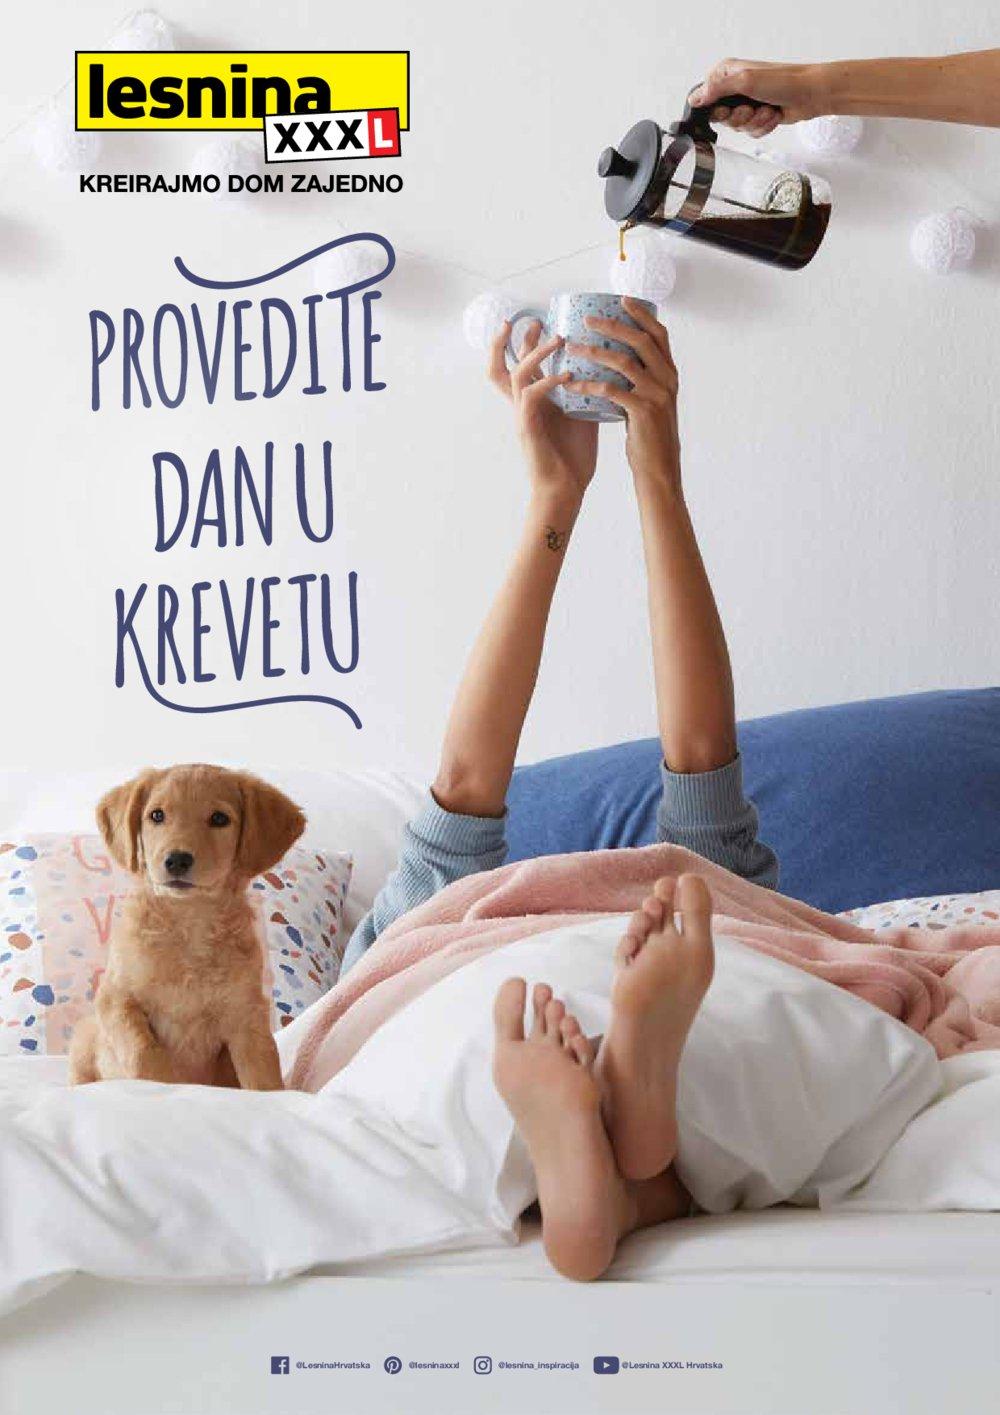 Lesnina katalog Provedite dan u krevetu 04.12.2020.-30.06.2021.